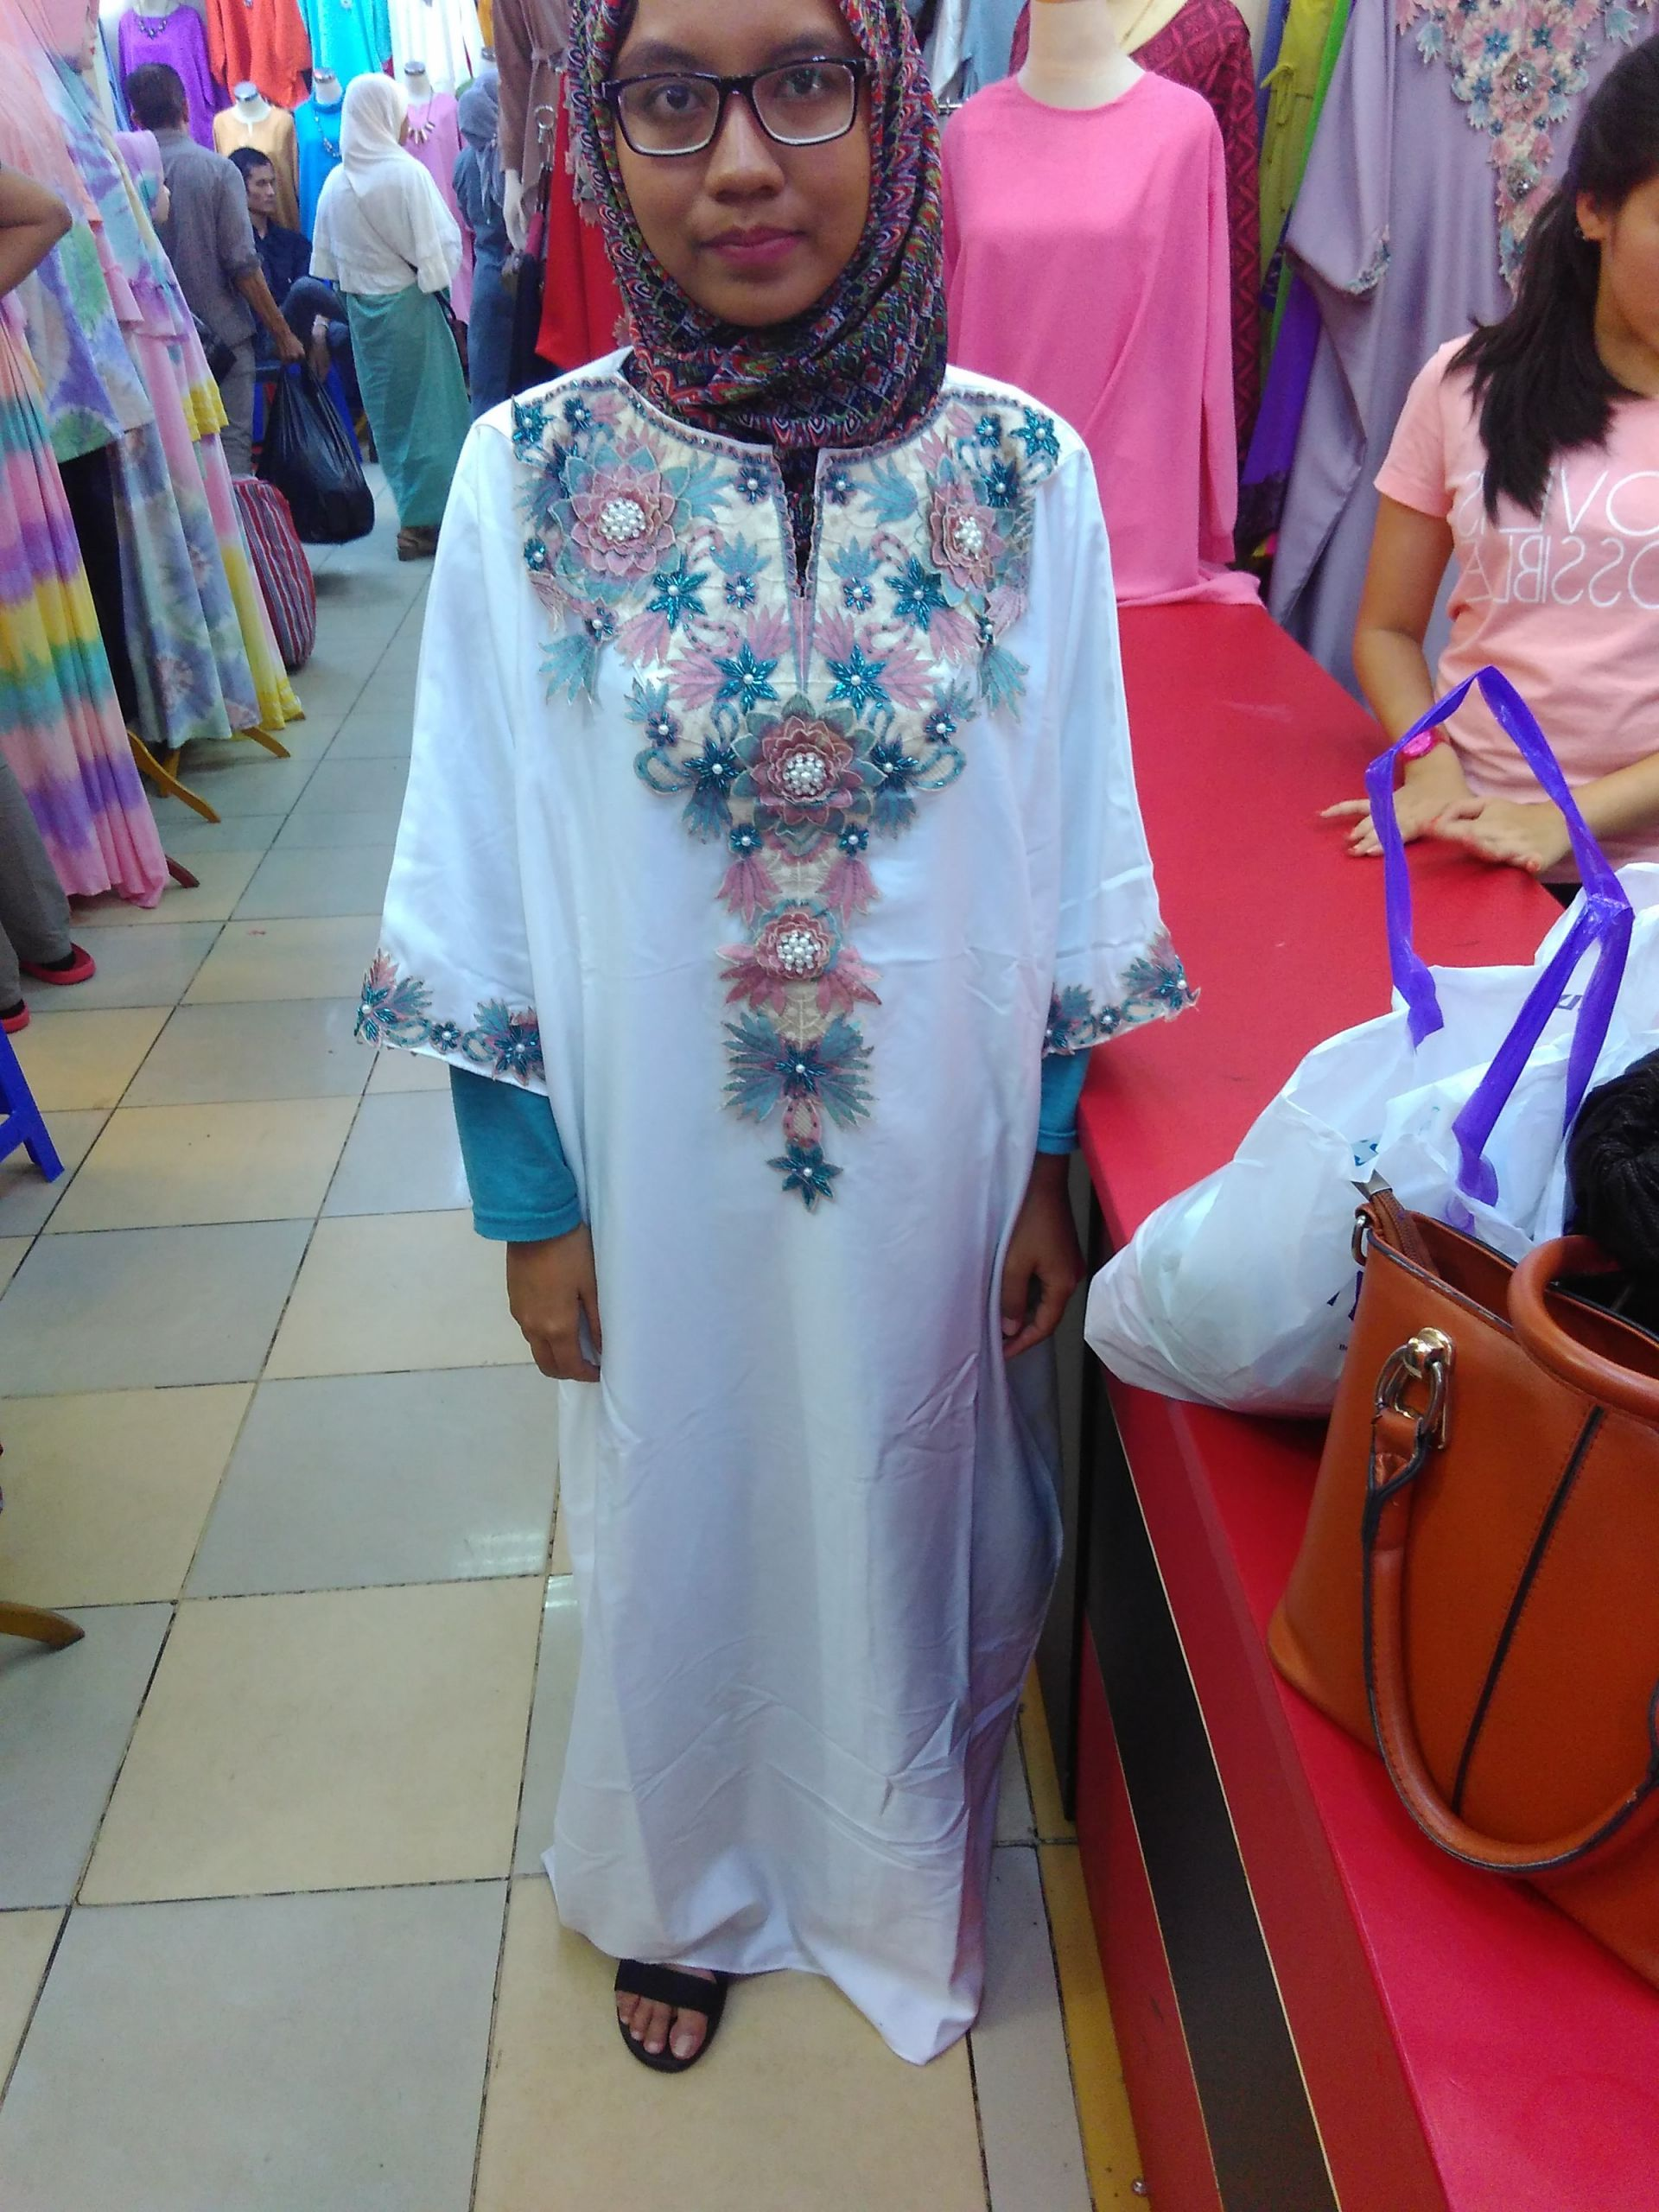 Inspirasi Model Baju Lebaran Di Thamrin City Wddj Thamcit Haul Belanja Di Thamrin City – Ceeta S Weblog